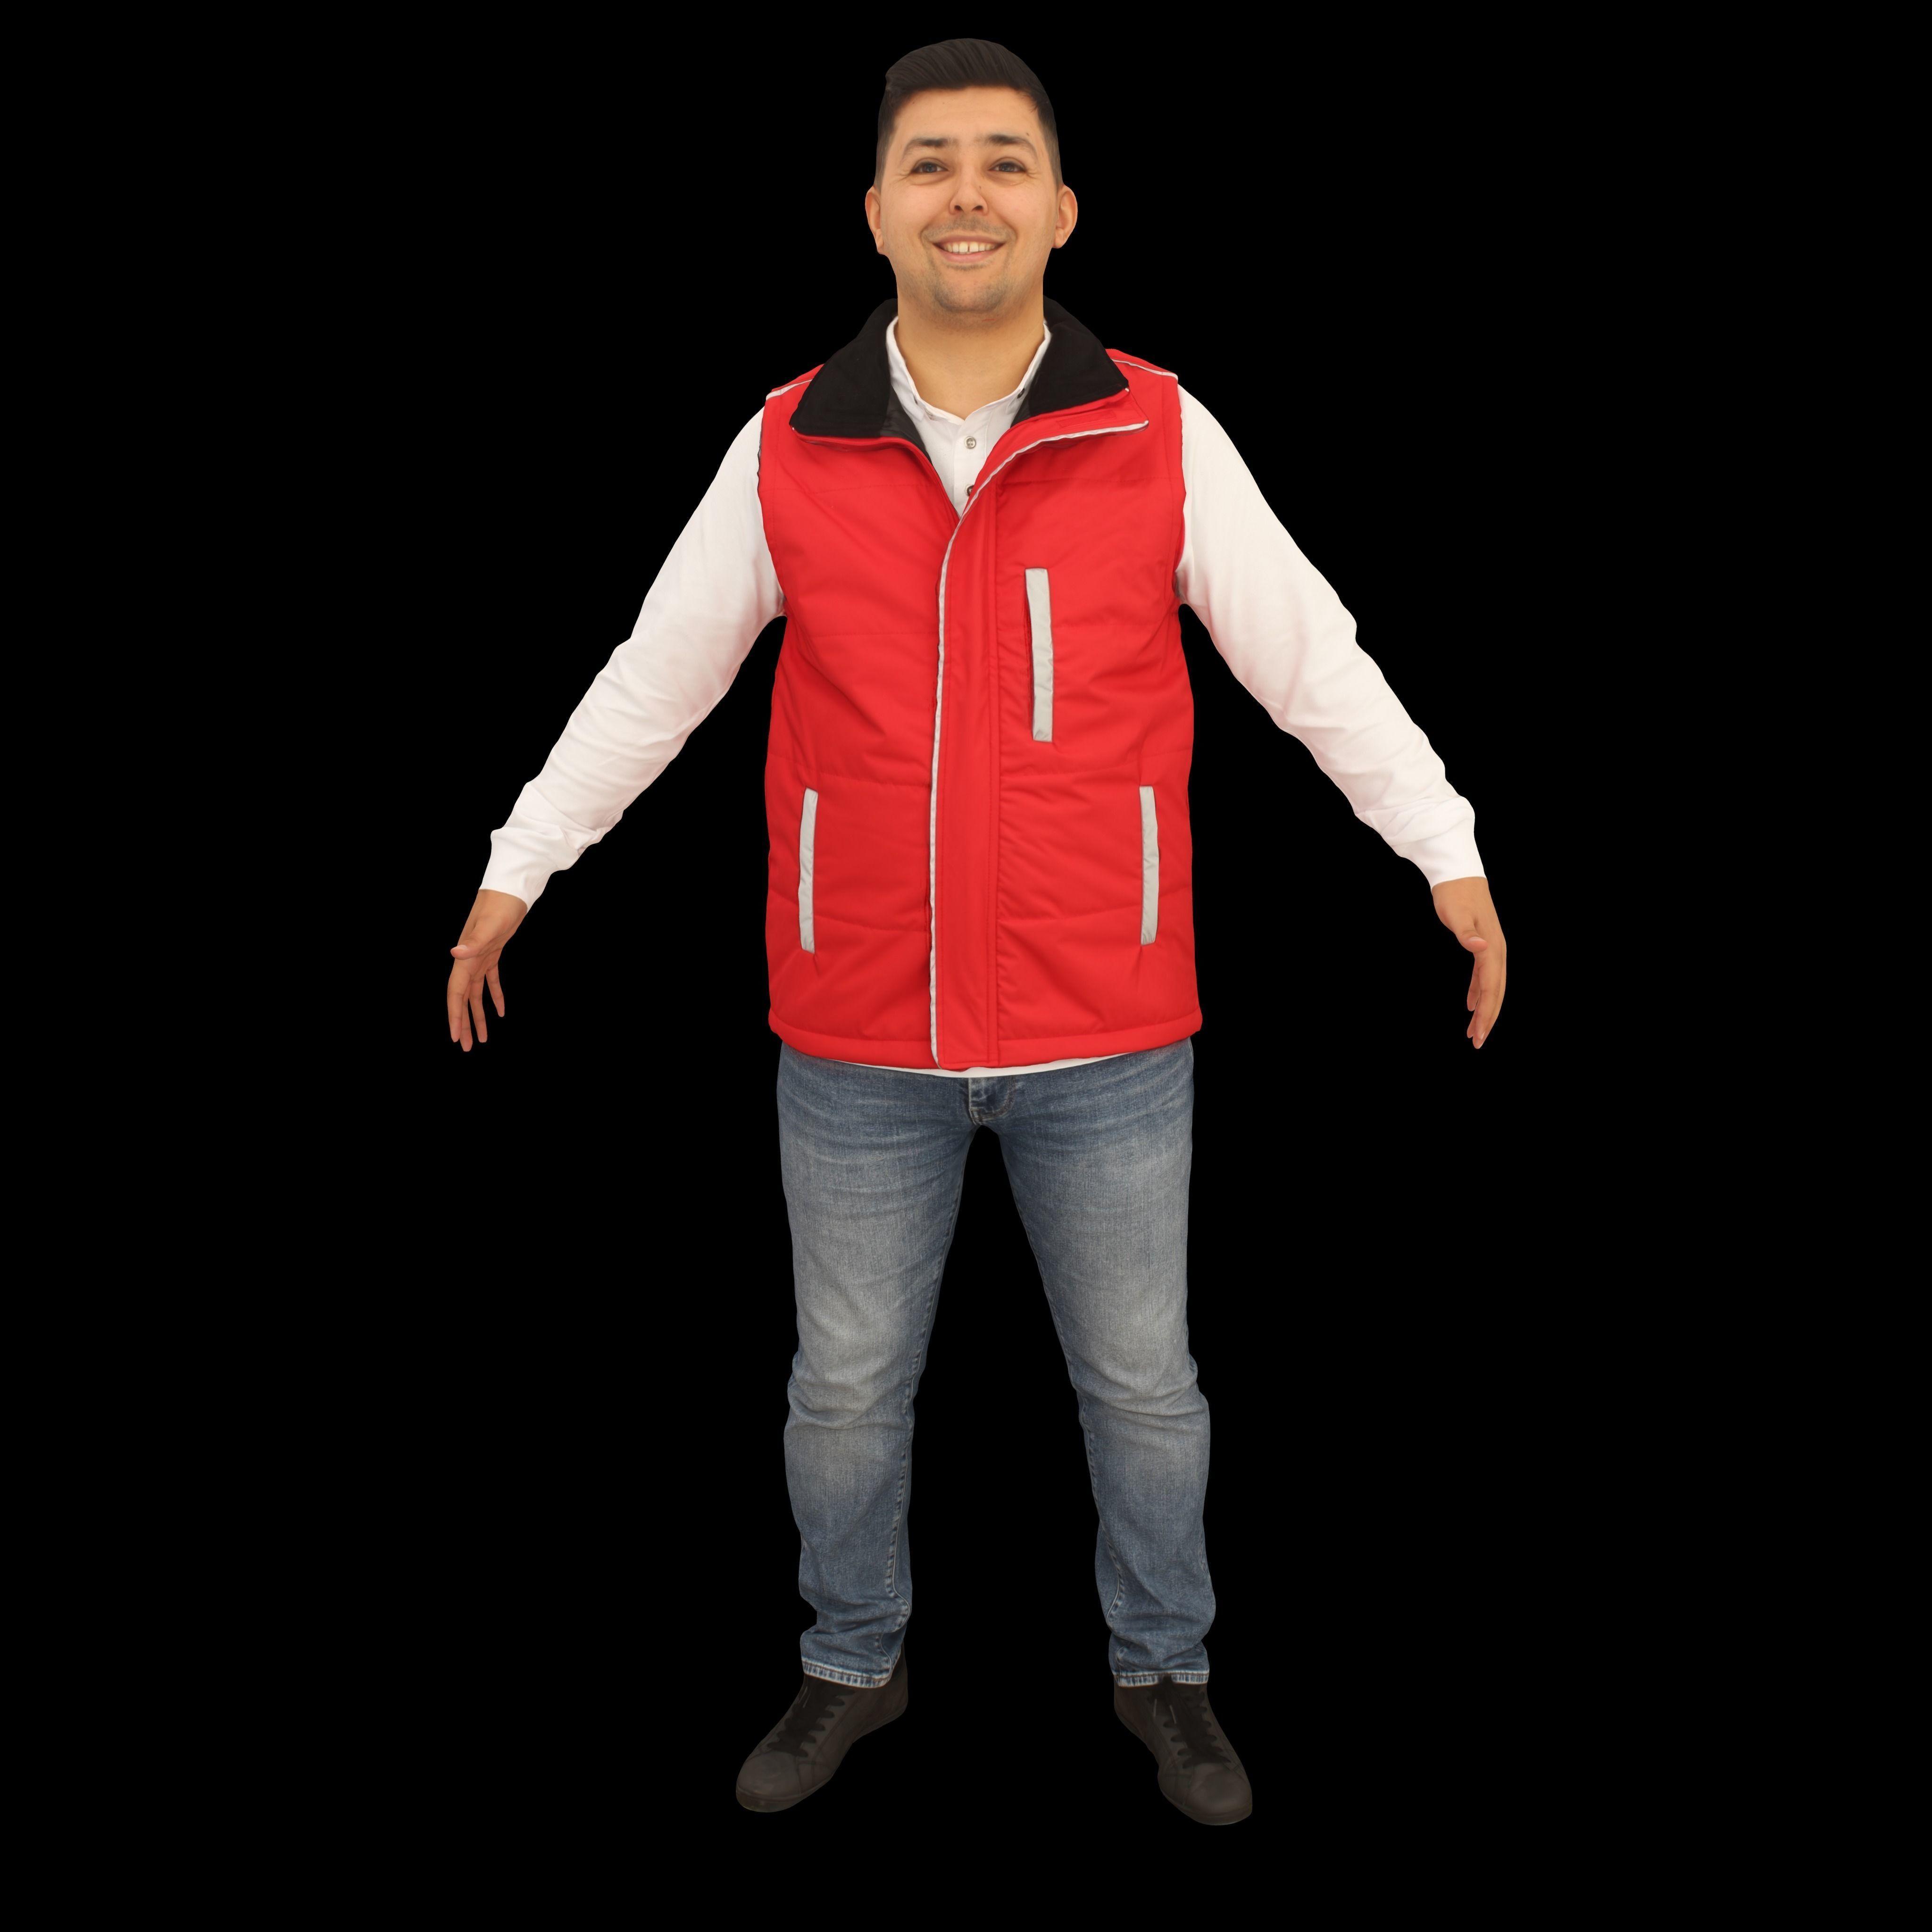 No449 - Red Vest Male A Pose